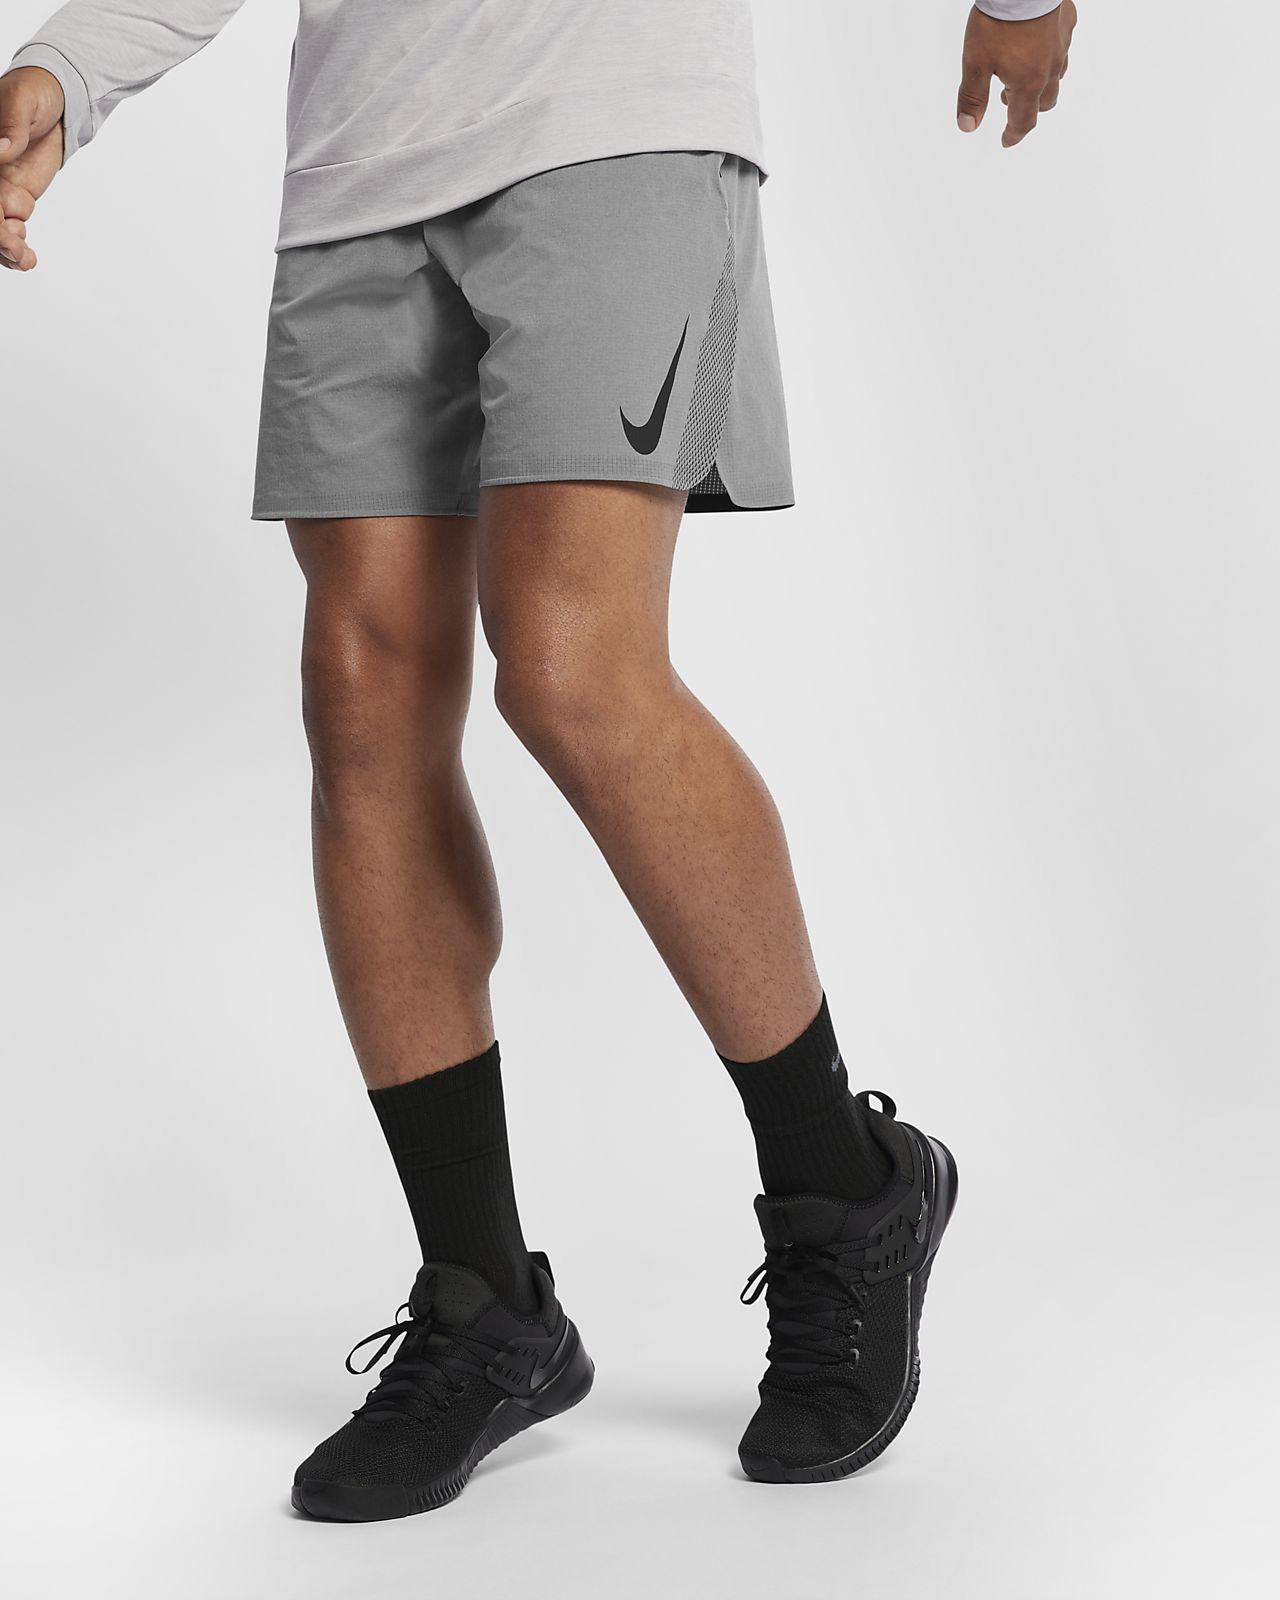 591a4d7fc7aa Nike Flex Repel Men s Training Shorts. Nike.com AU